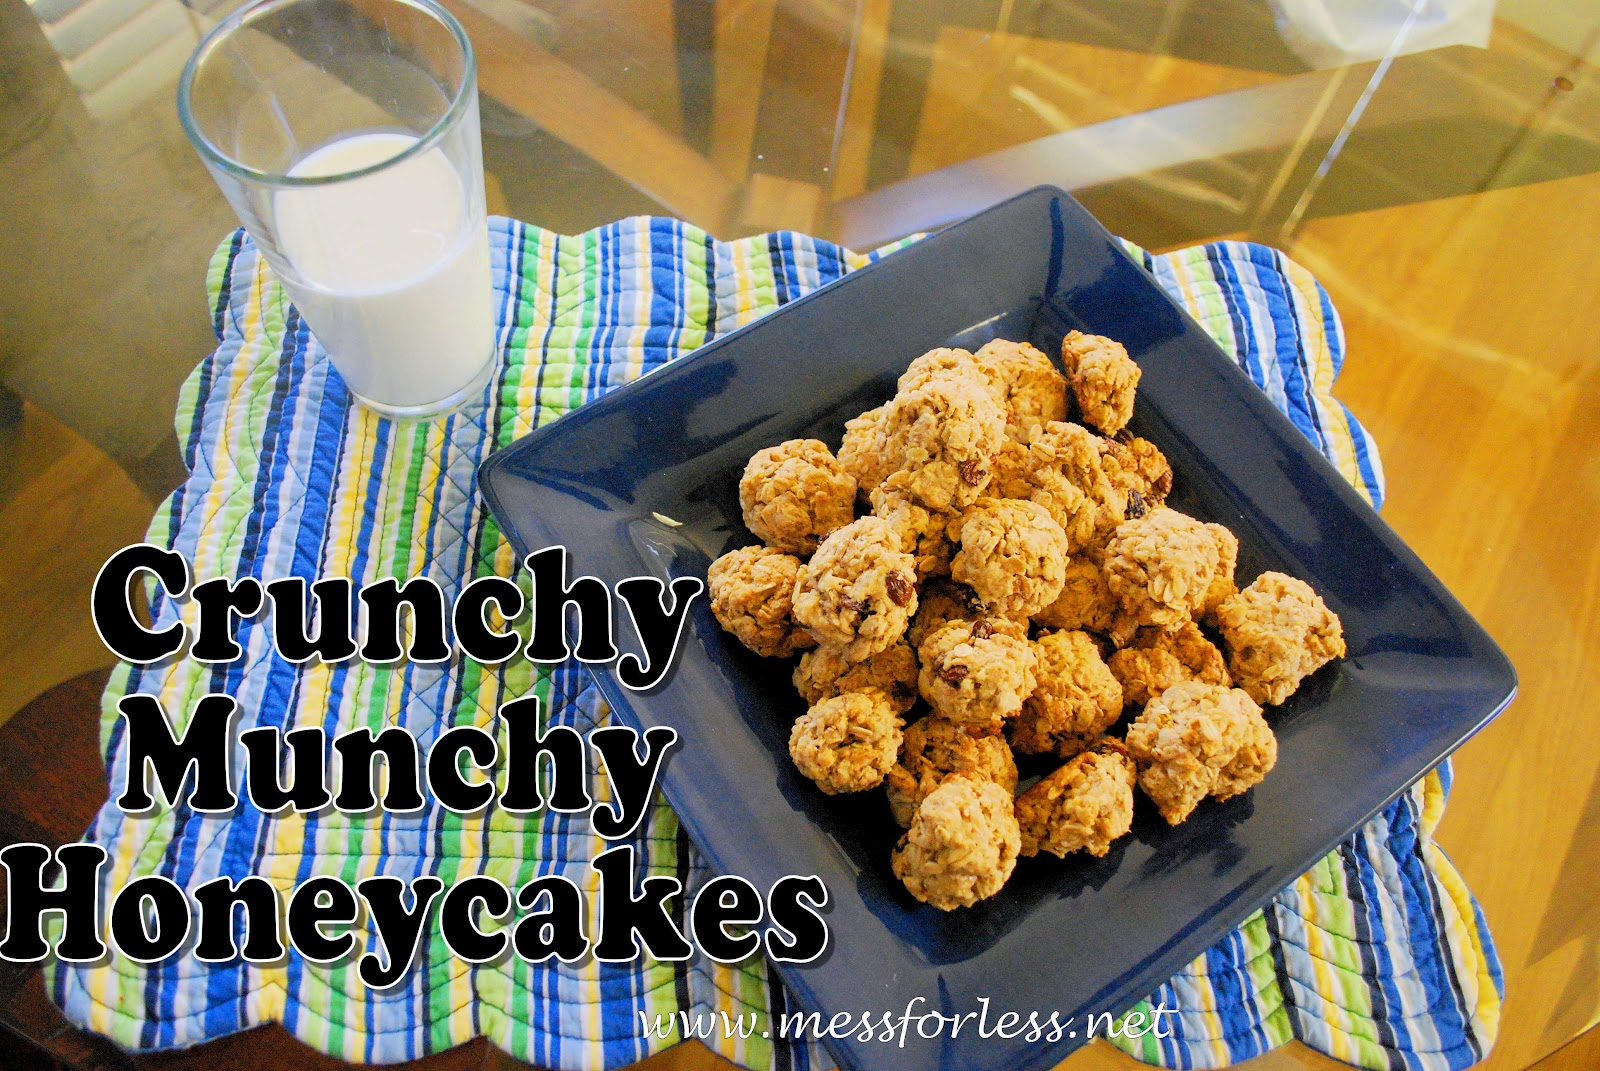 7 Photos of Crunchy Munchy Honey Cakes